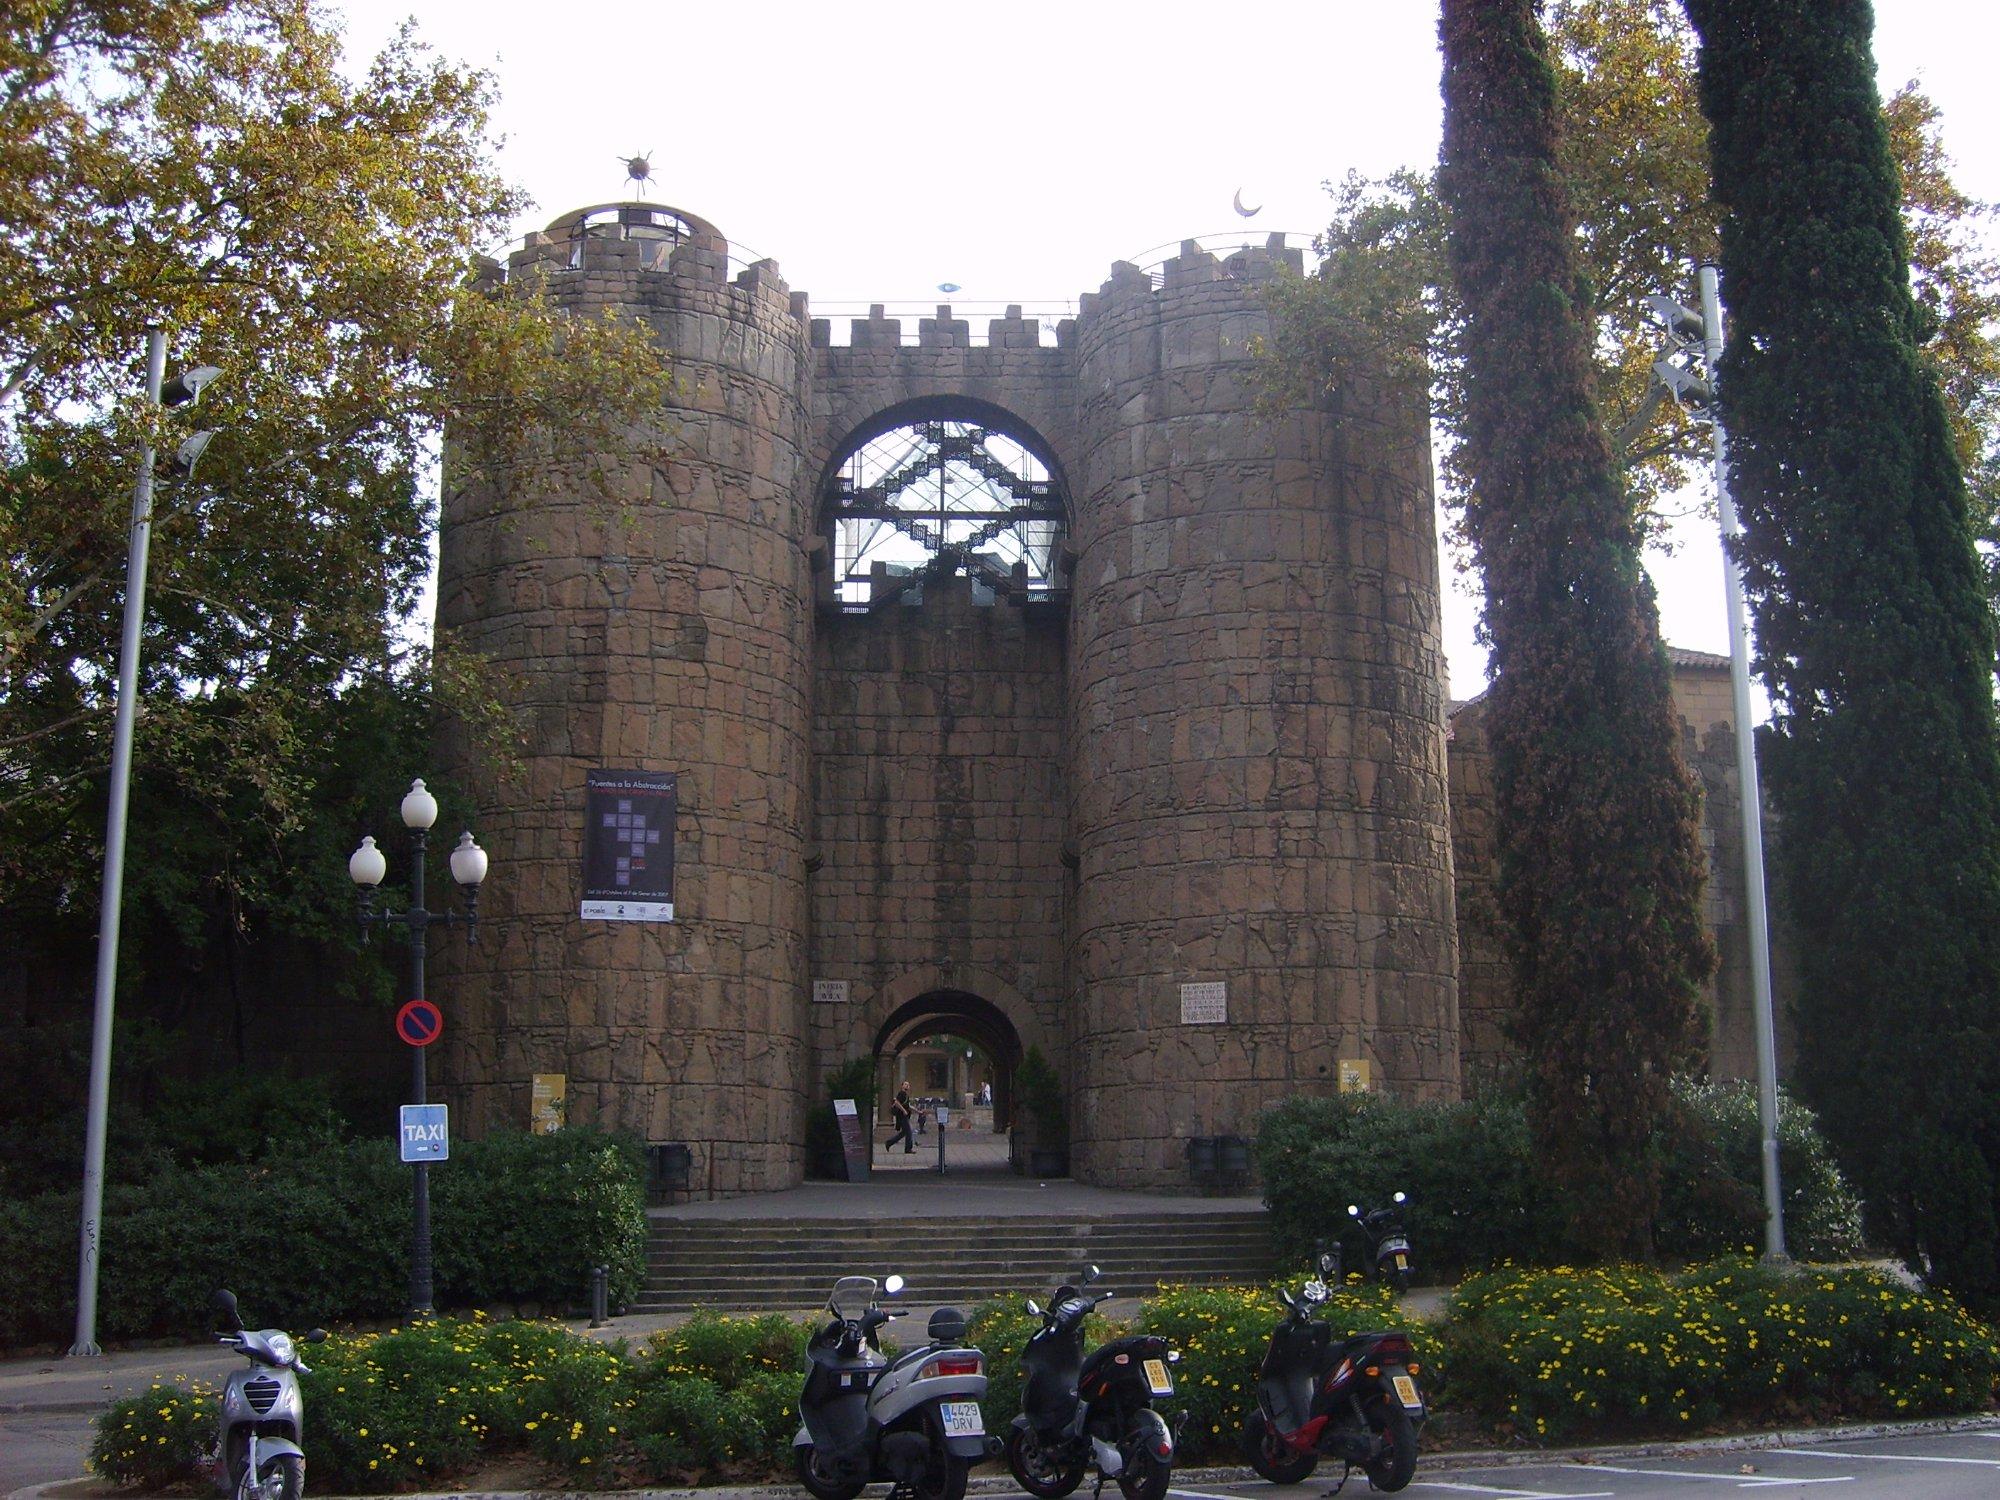 Entrance to Poble Espanyol in Barcelona